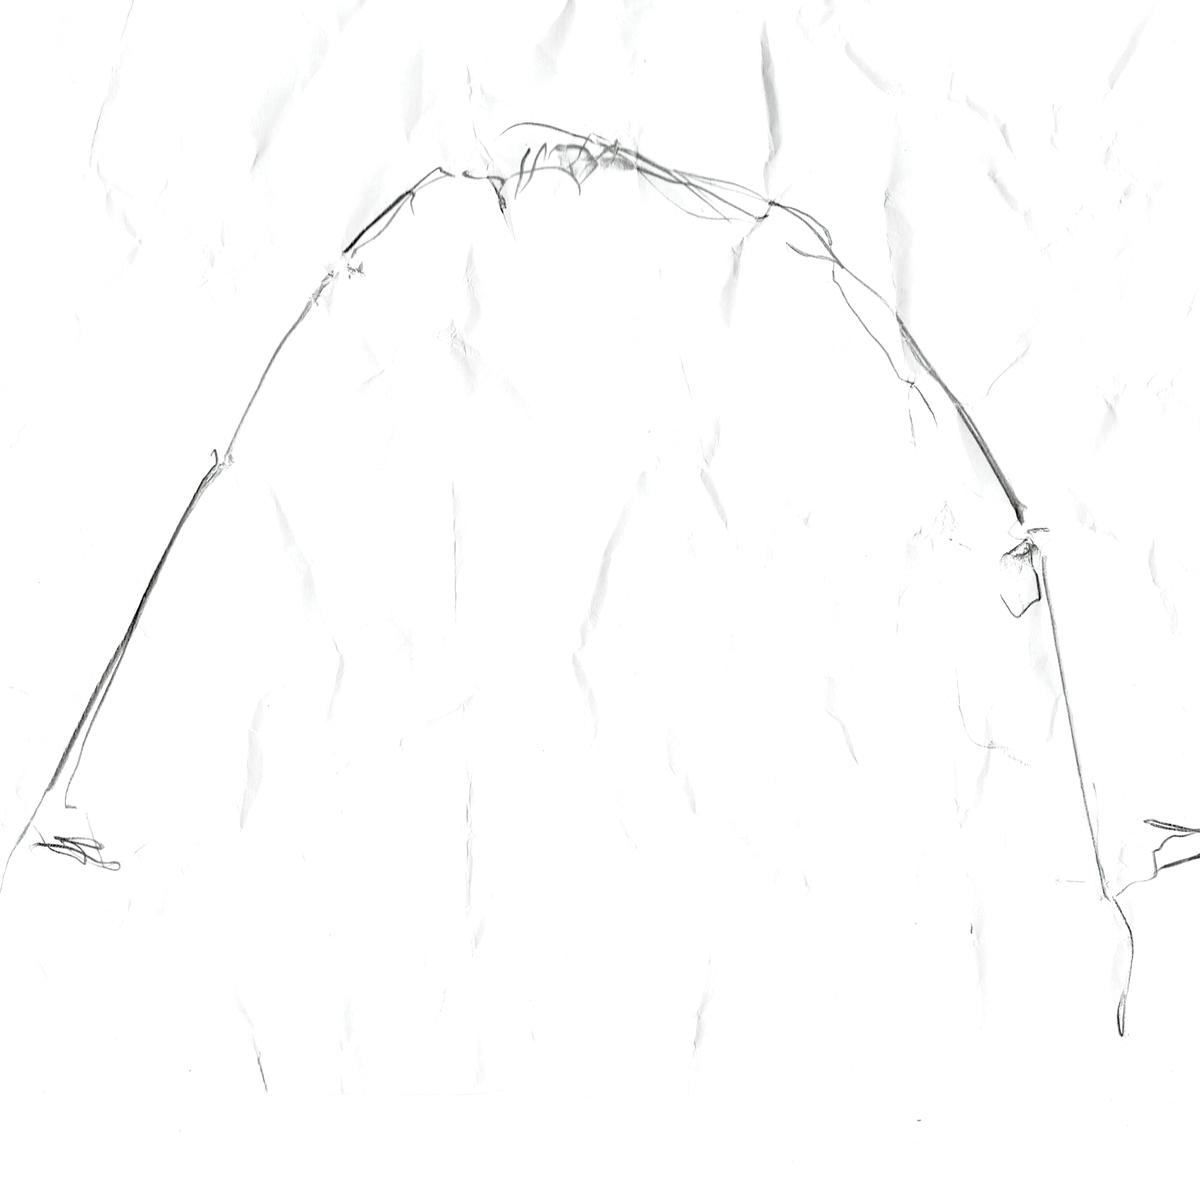 f:id:donaneight:20211014093609j:plain